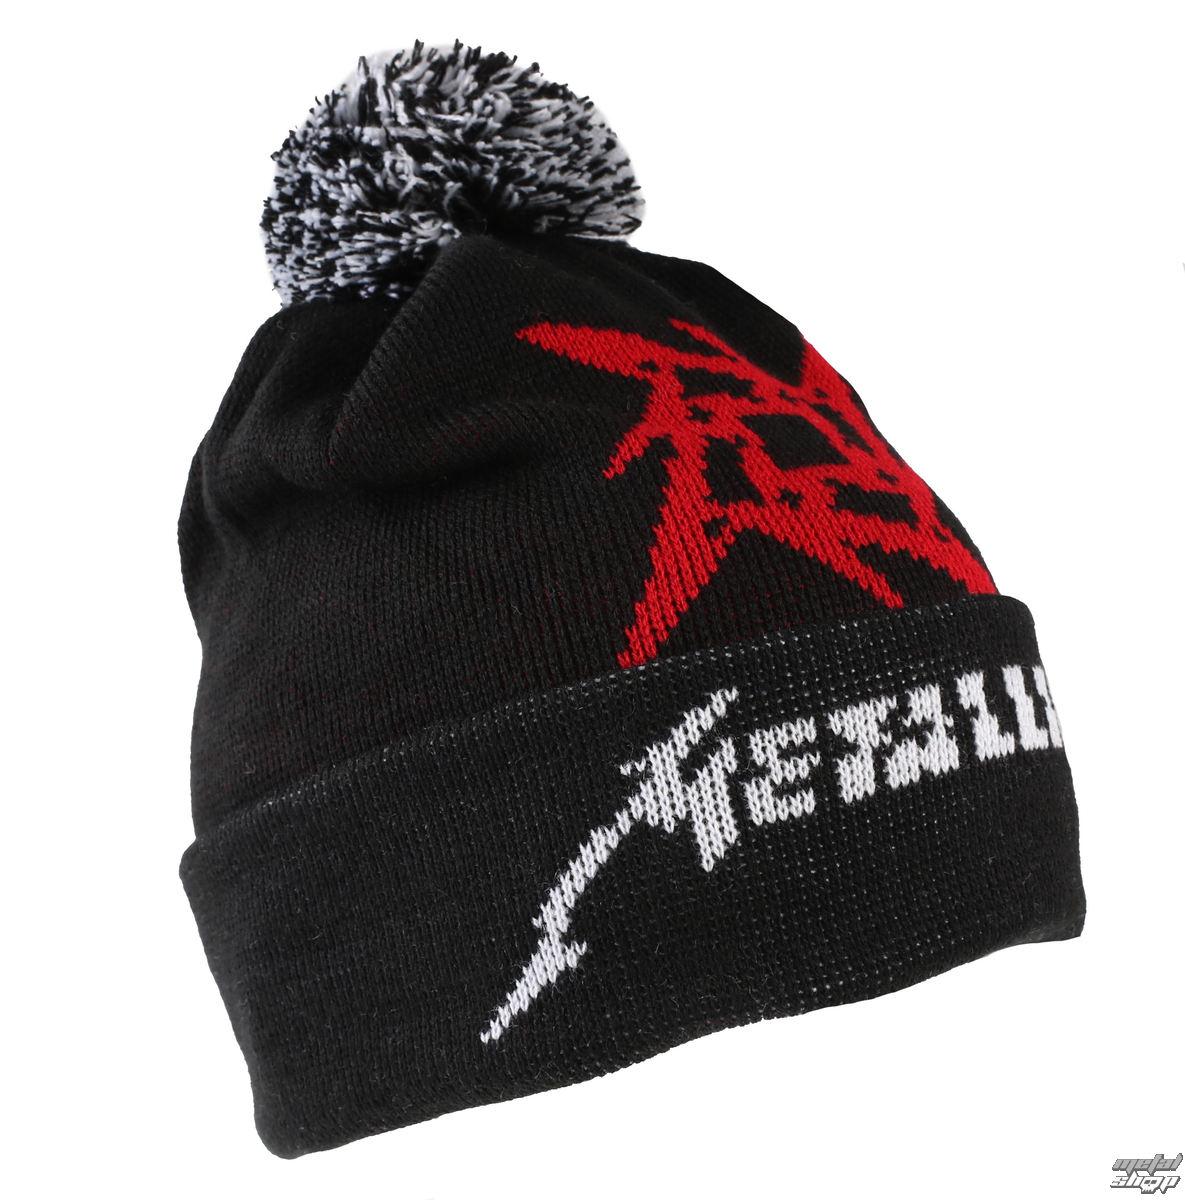 Official Metallica Glitch Star Logo Black Woven Bobble Hat